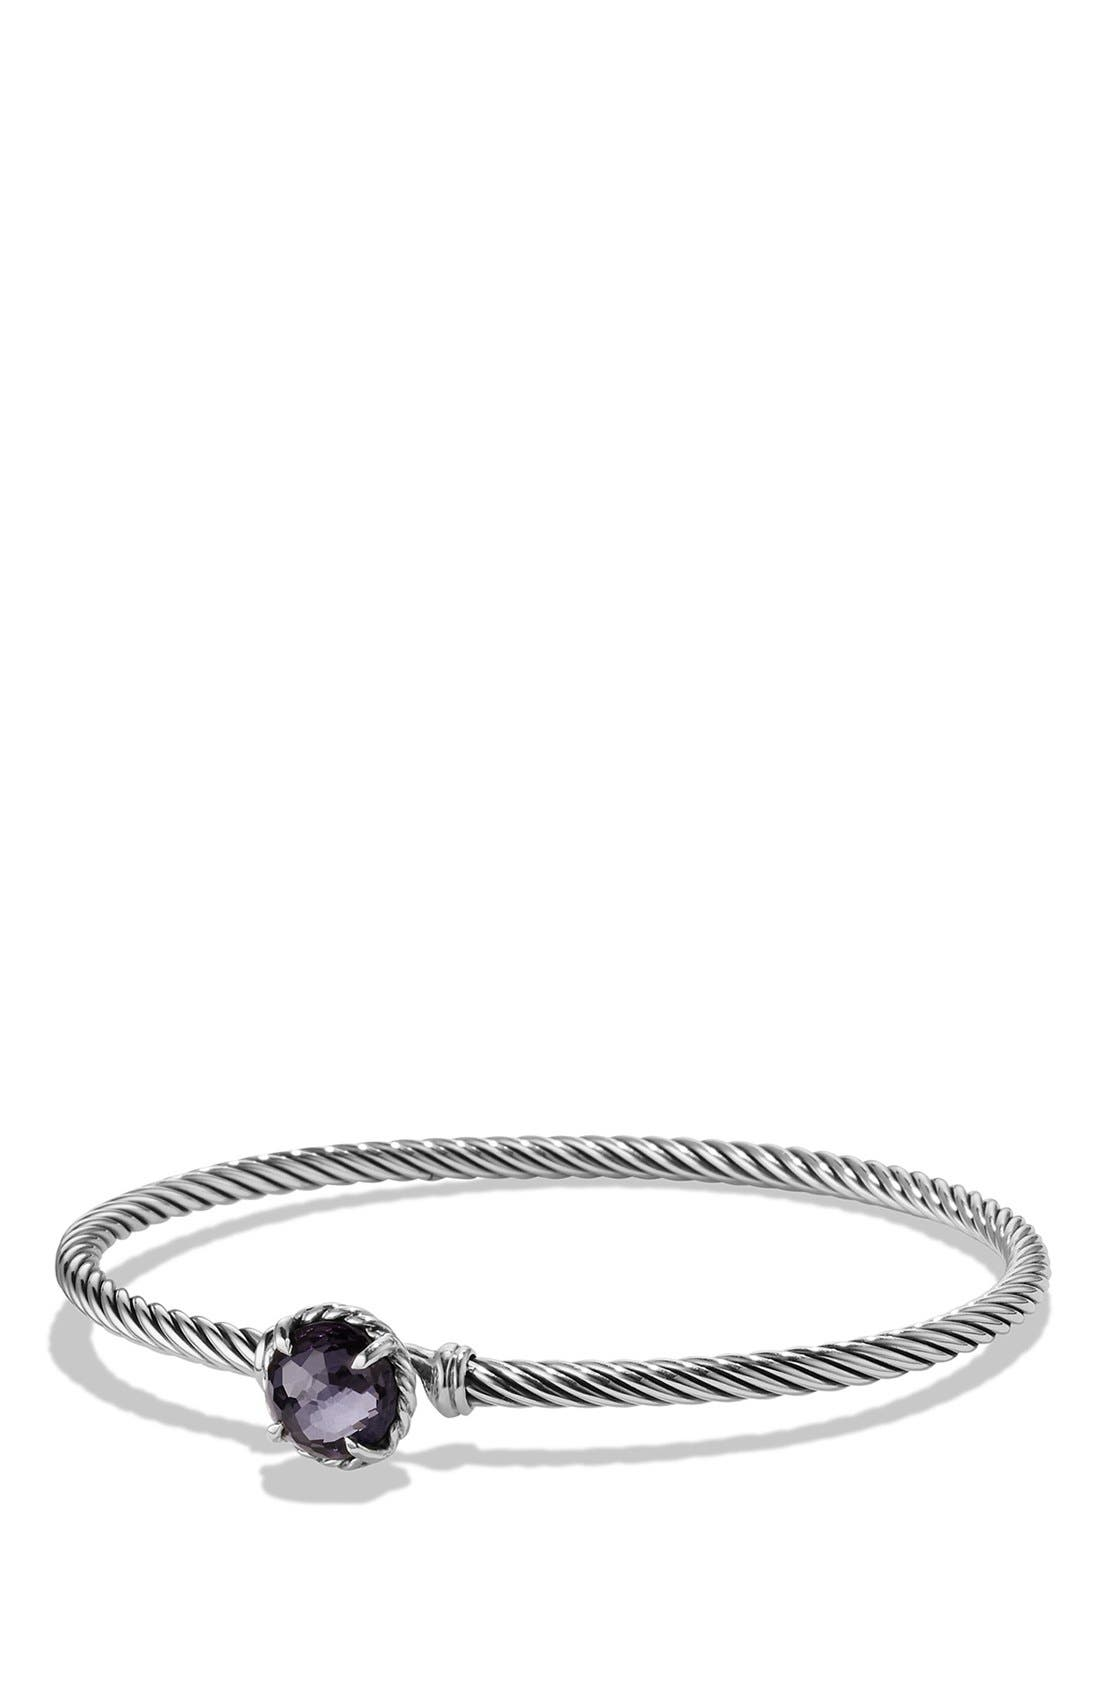 Alternate Image 1 Selected - David Yurman 'Color Classics' Bangle Bracelet